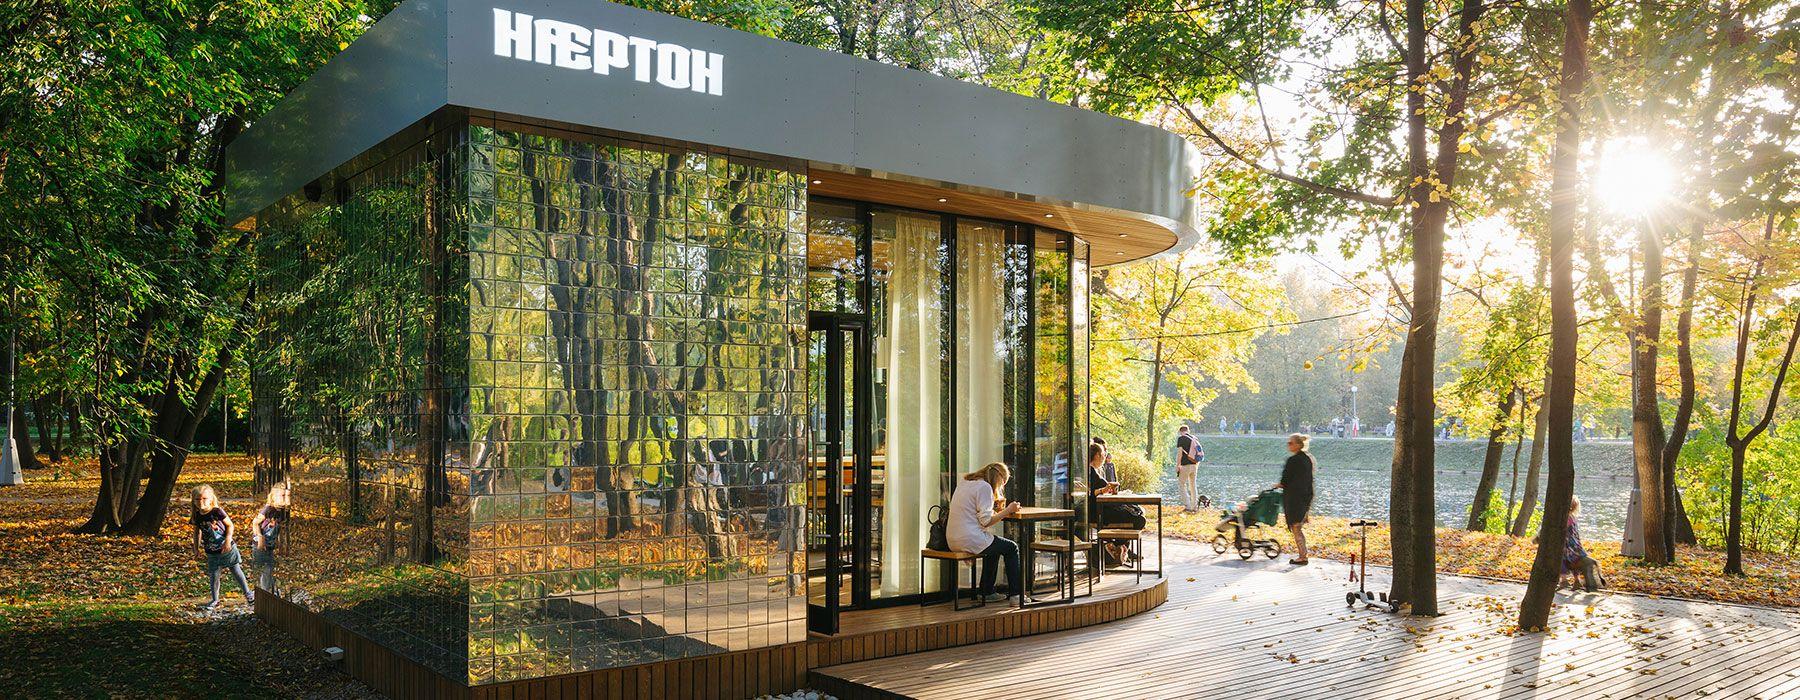 Metafizika Narton Cafe Pavilion In Moscow Russia Pavilion Architecture Wooden Pavilion